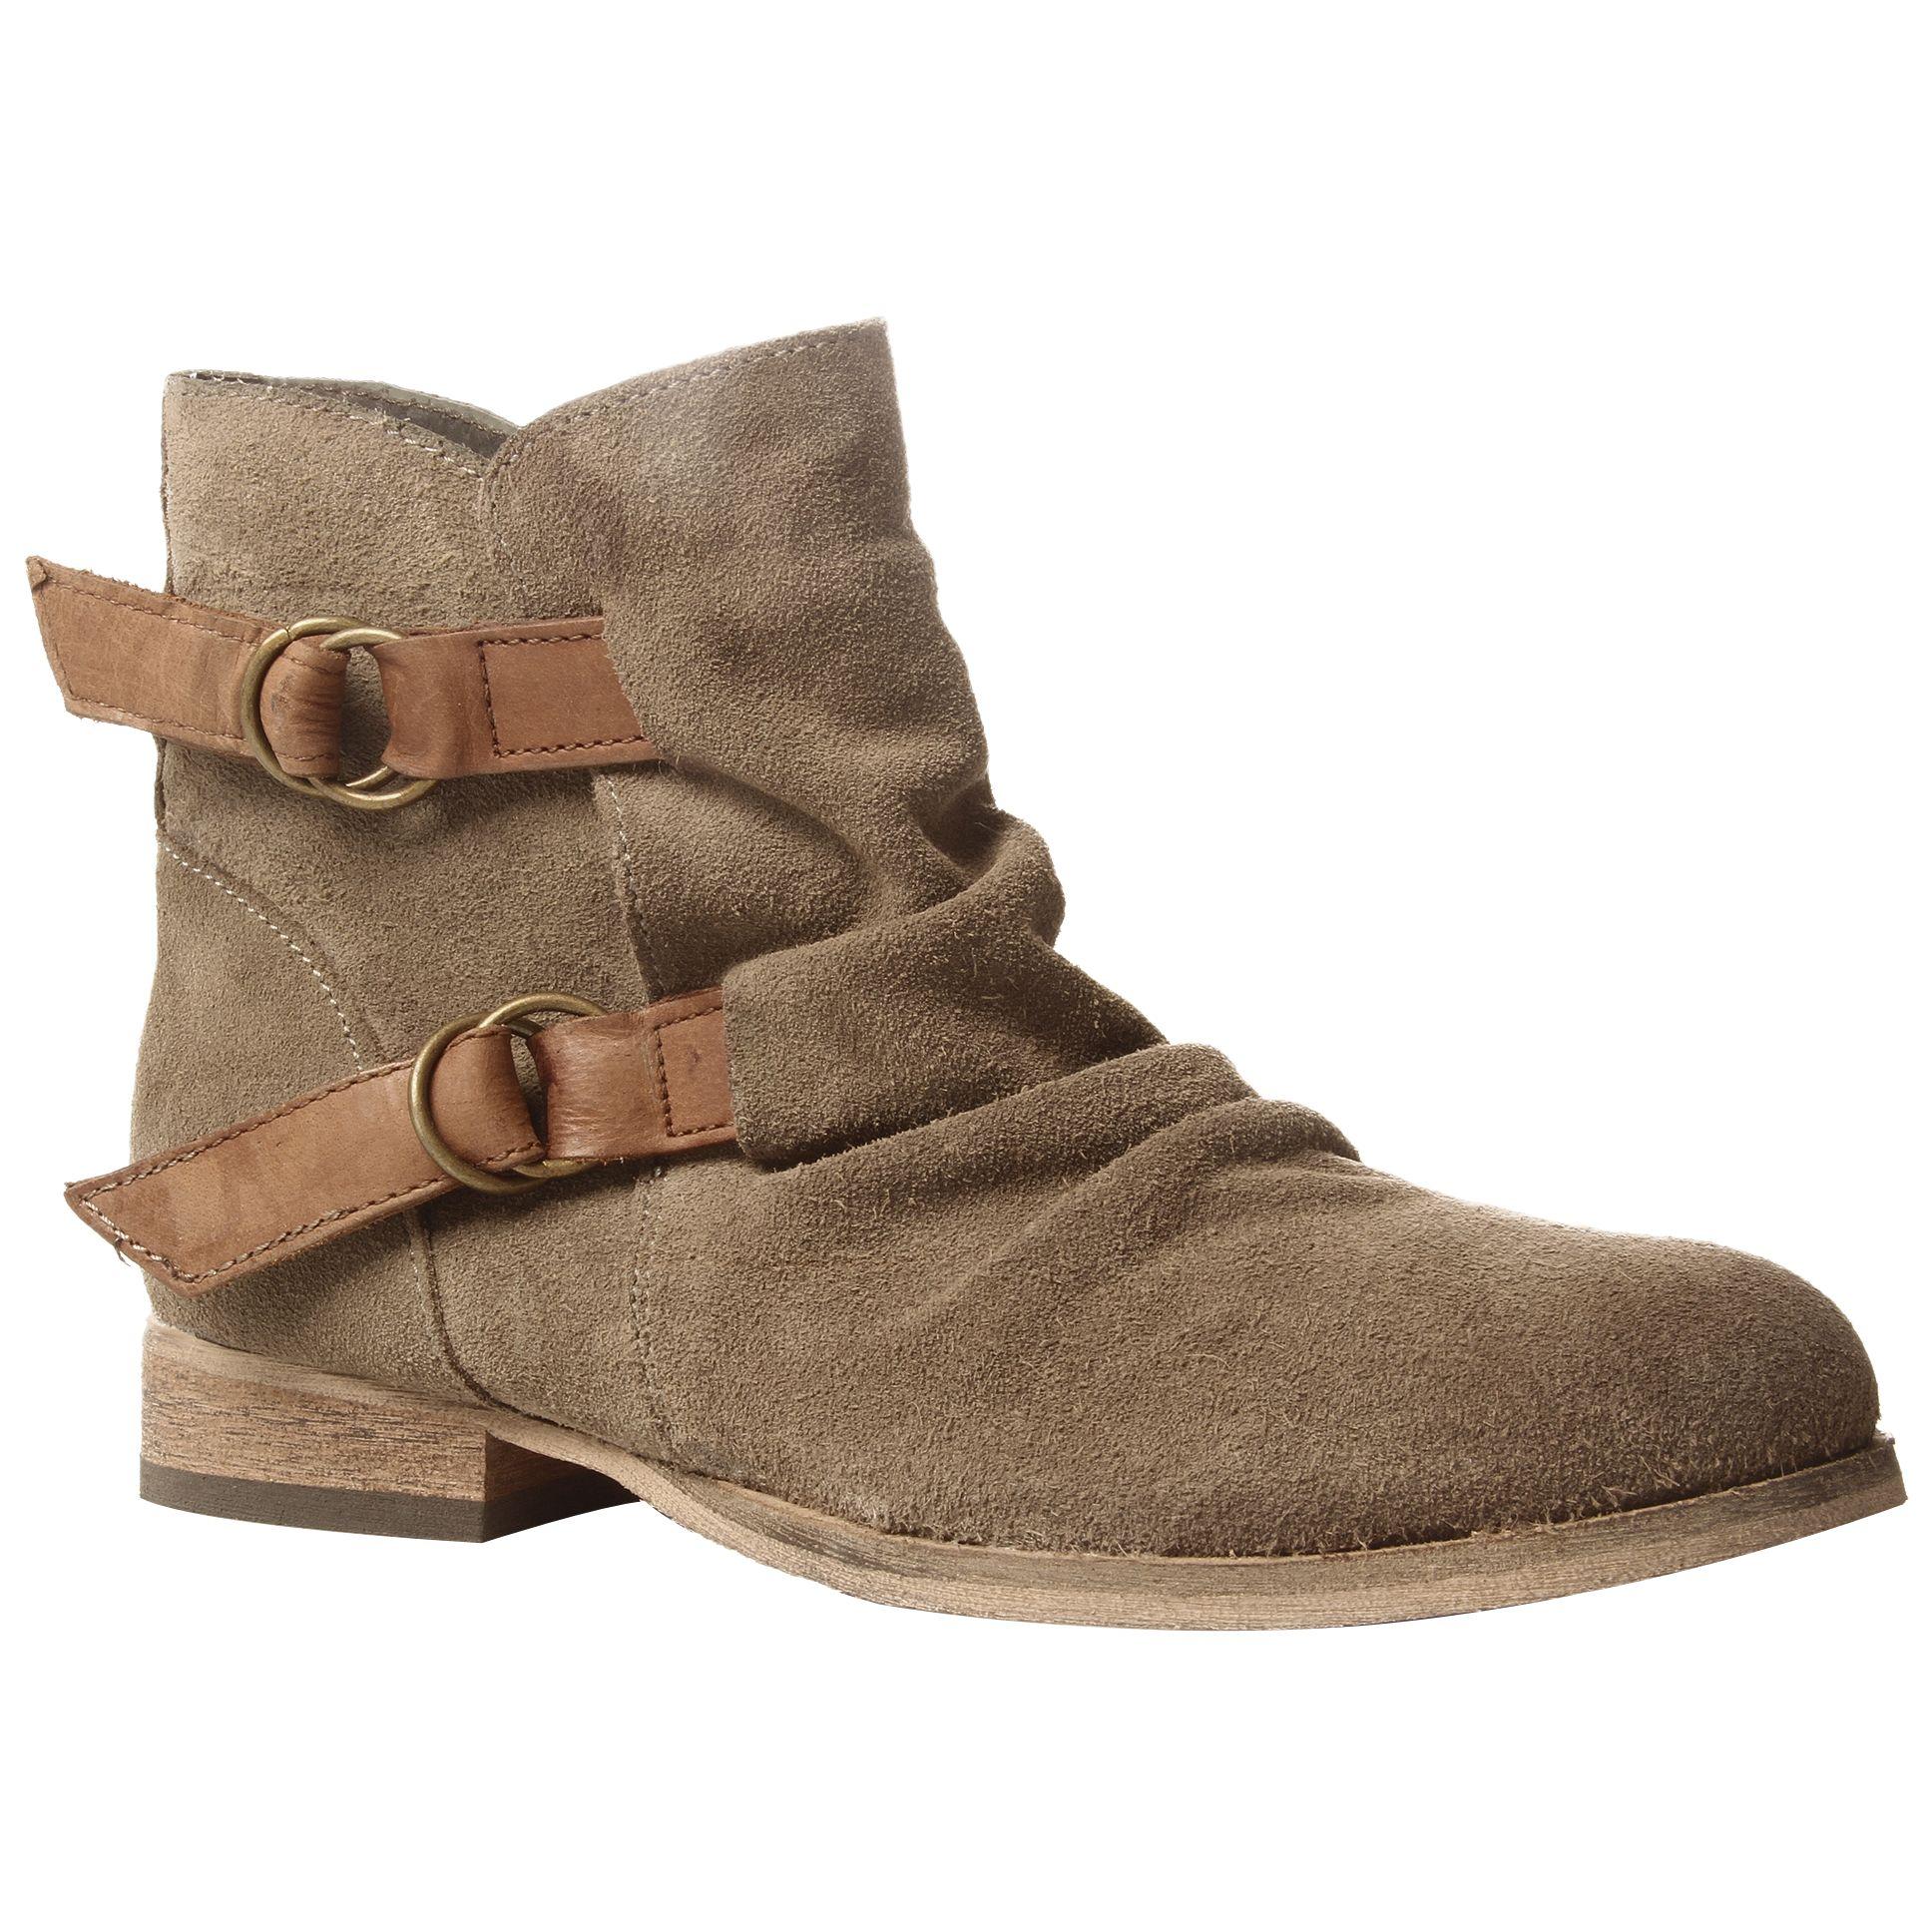 KG by Kurt Geiger Sandbanks Suede Ankle Boots, Neutrals at John Lewis